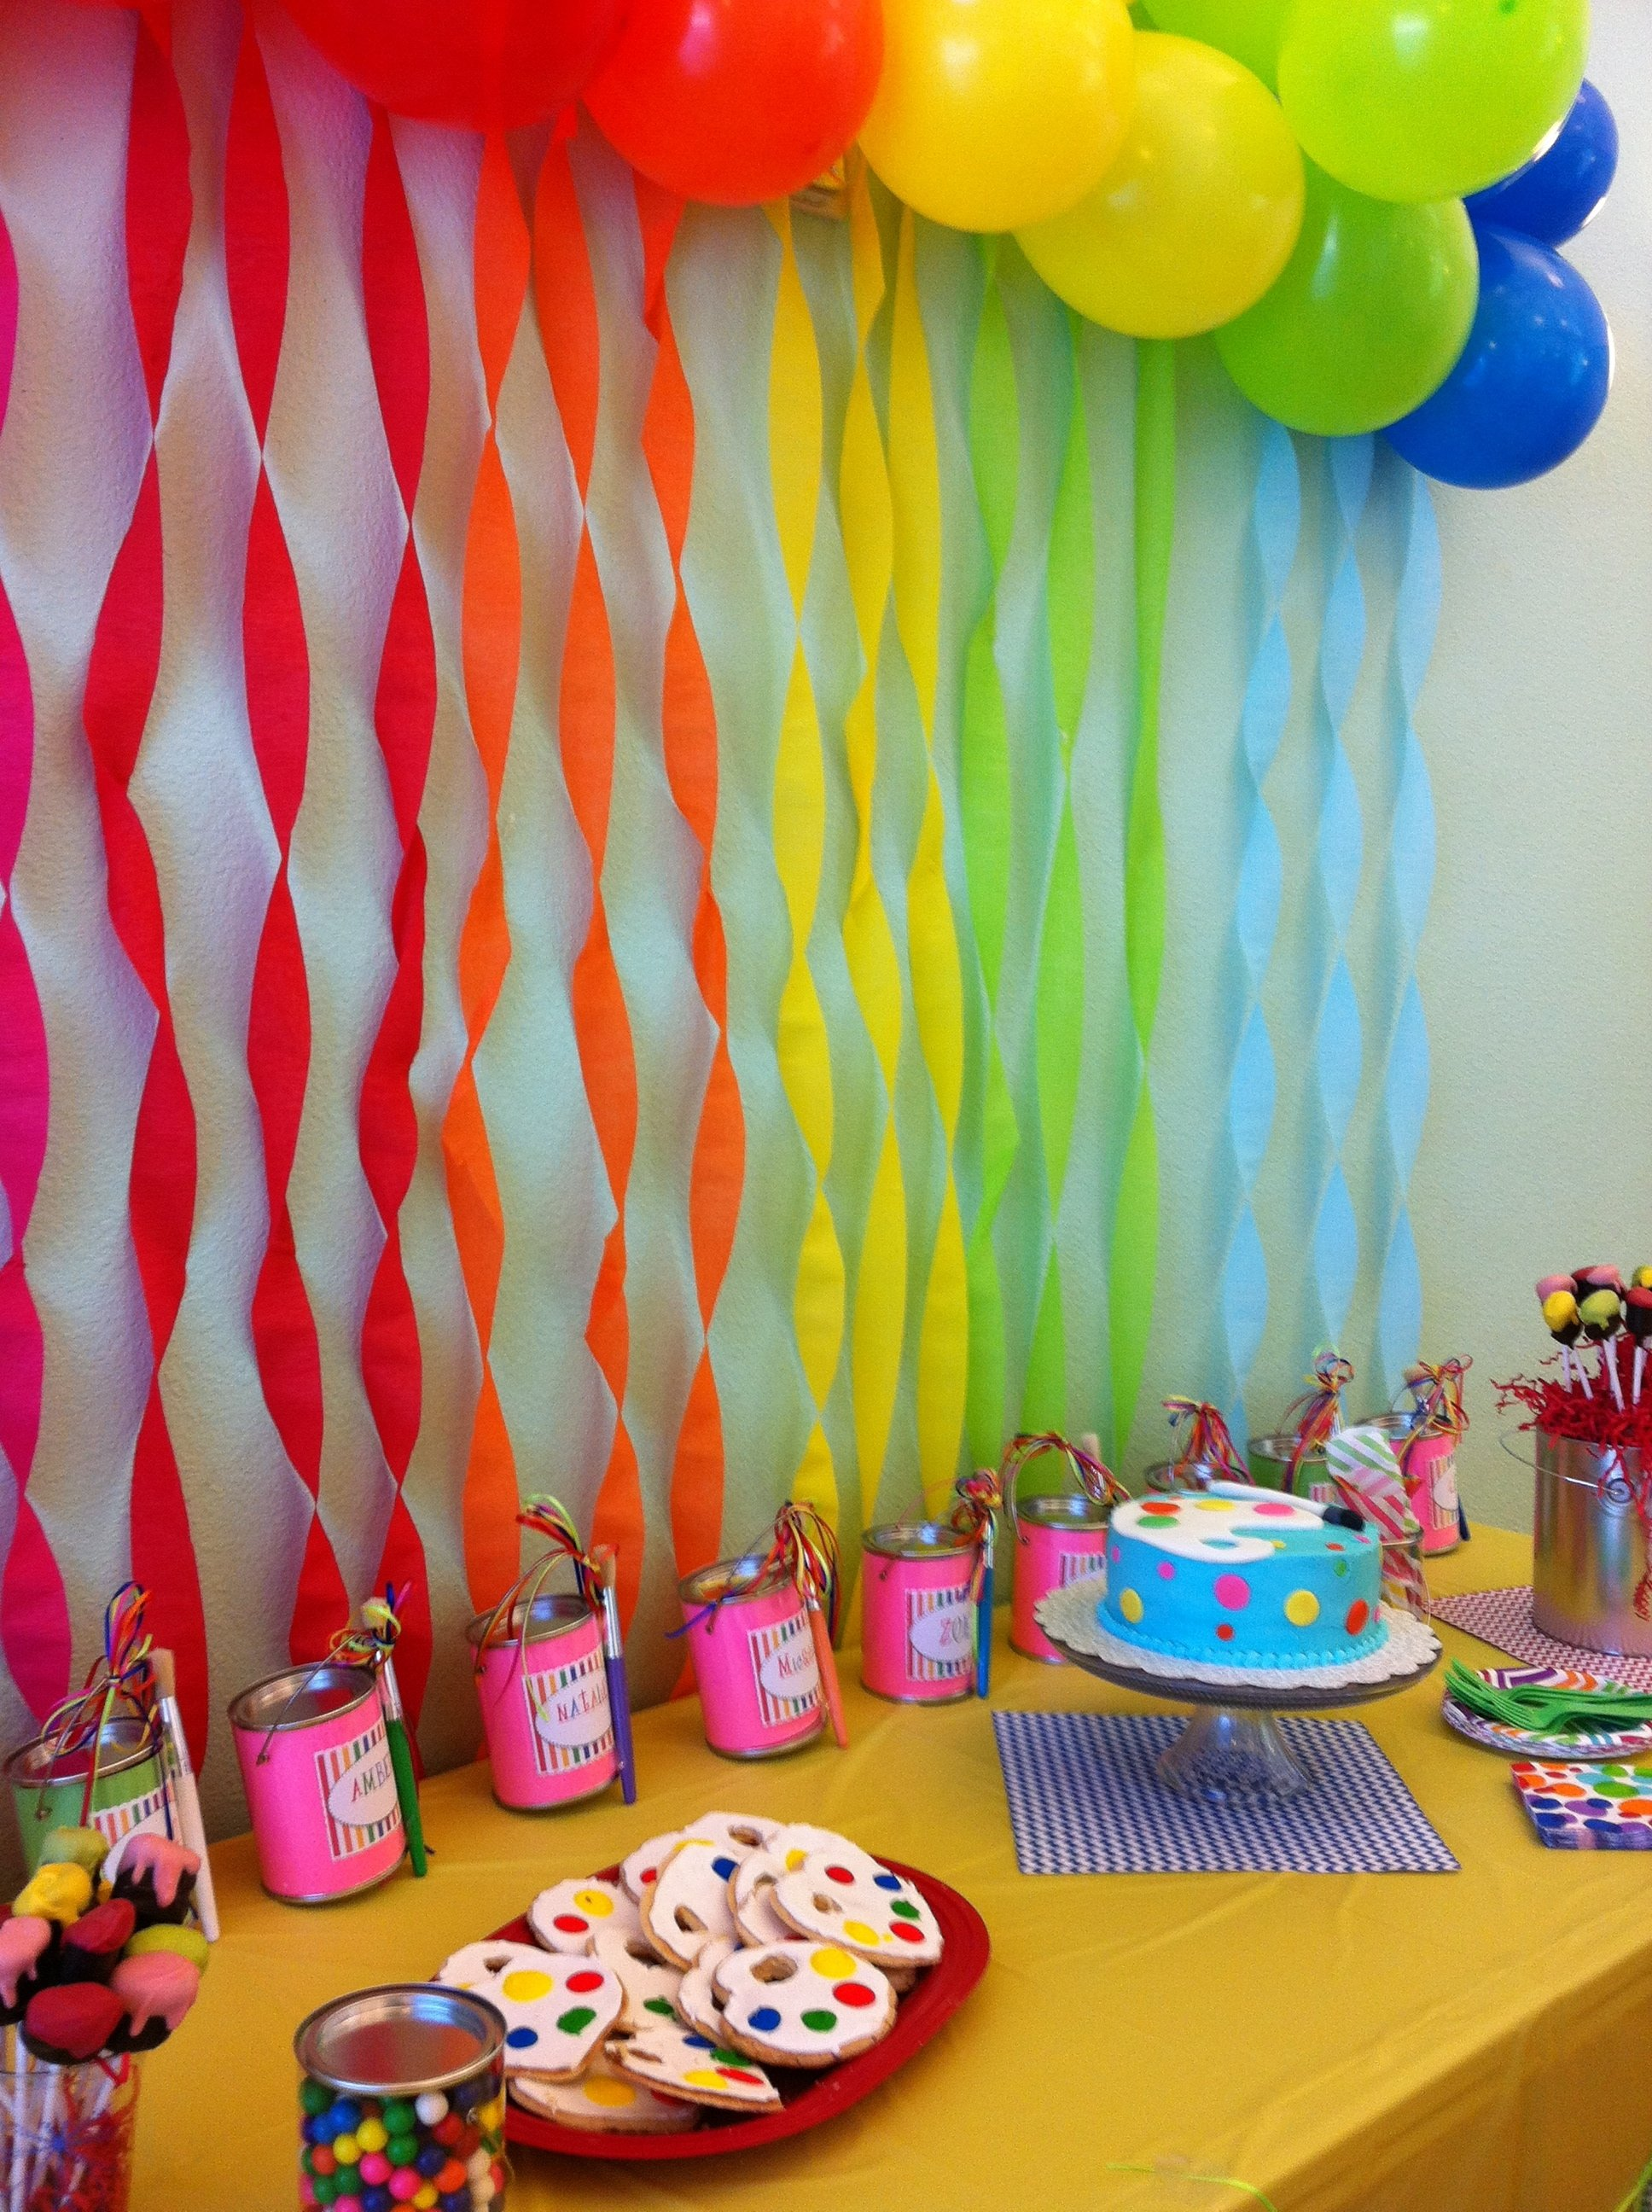 10 Lovable 4 Yr Old Girl Birthday Party Ideas 8 year old girl birthday art party art party pinterest art 2 2020